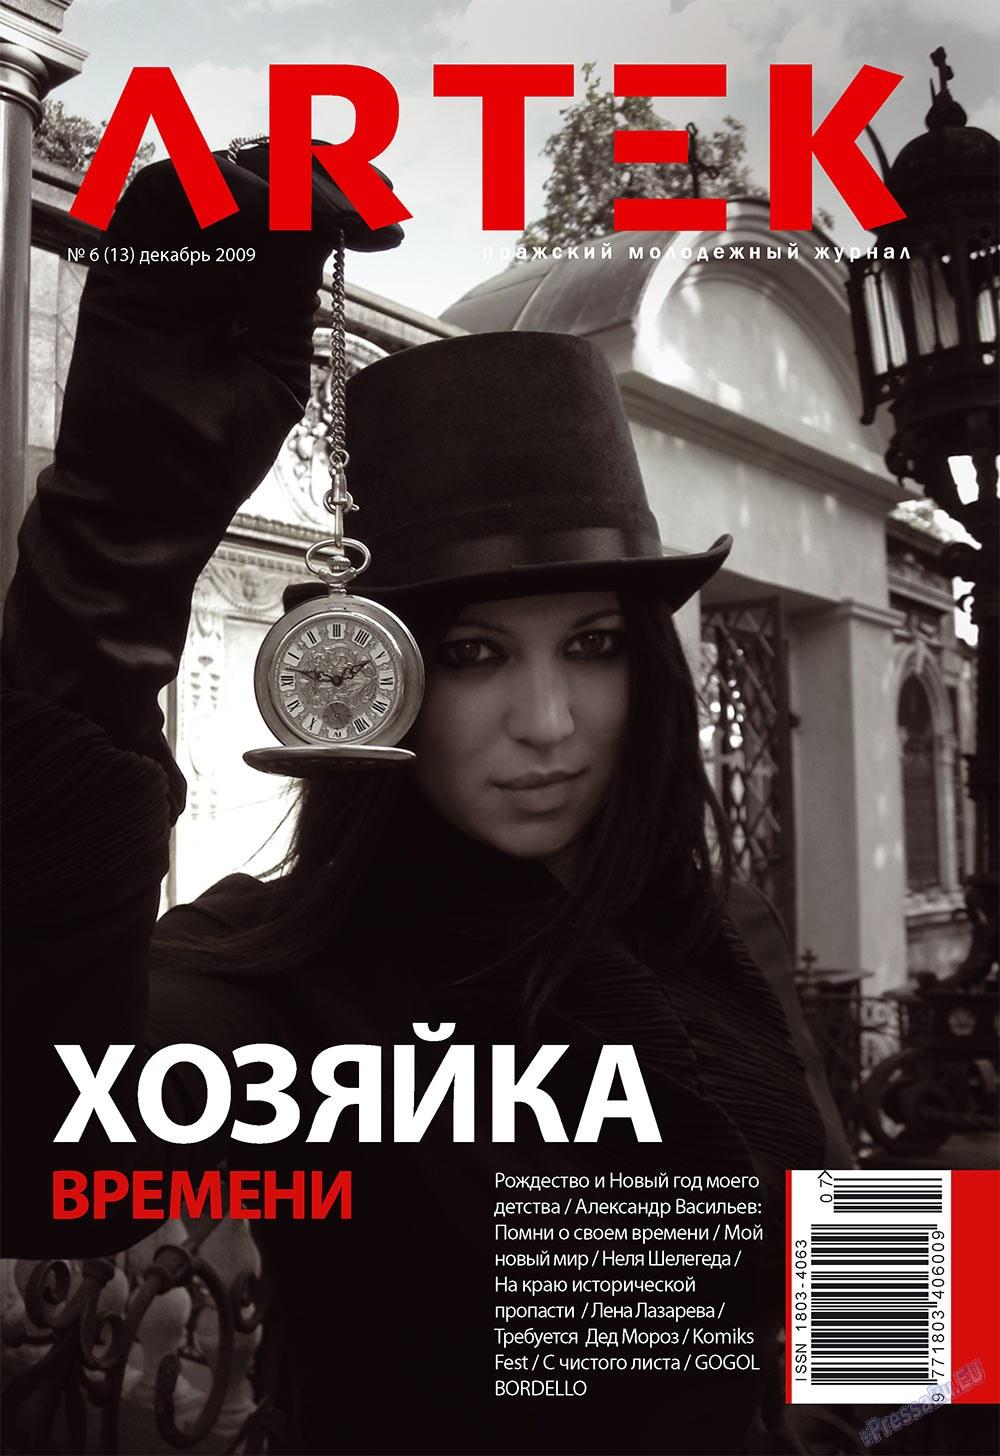 Артек (журнал). 2009 год, номер 6, стр. 1